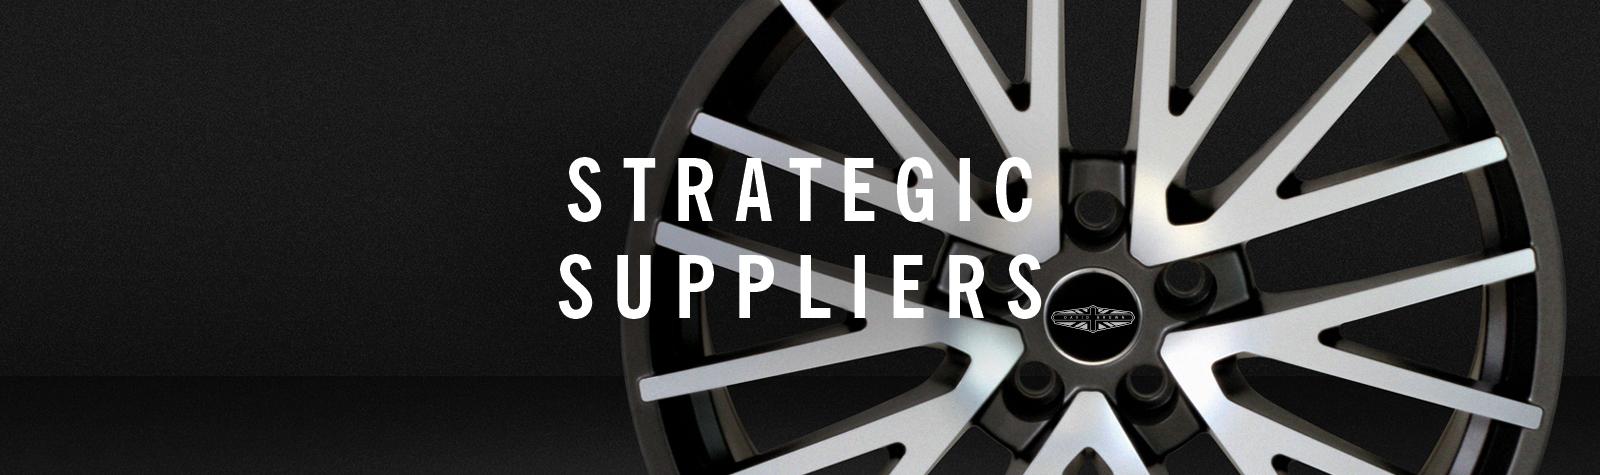 Strategic Suppliers